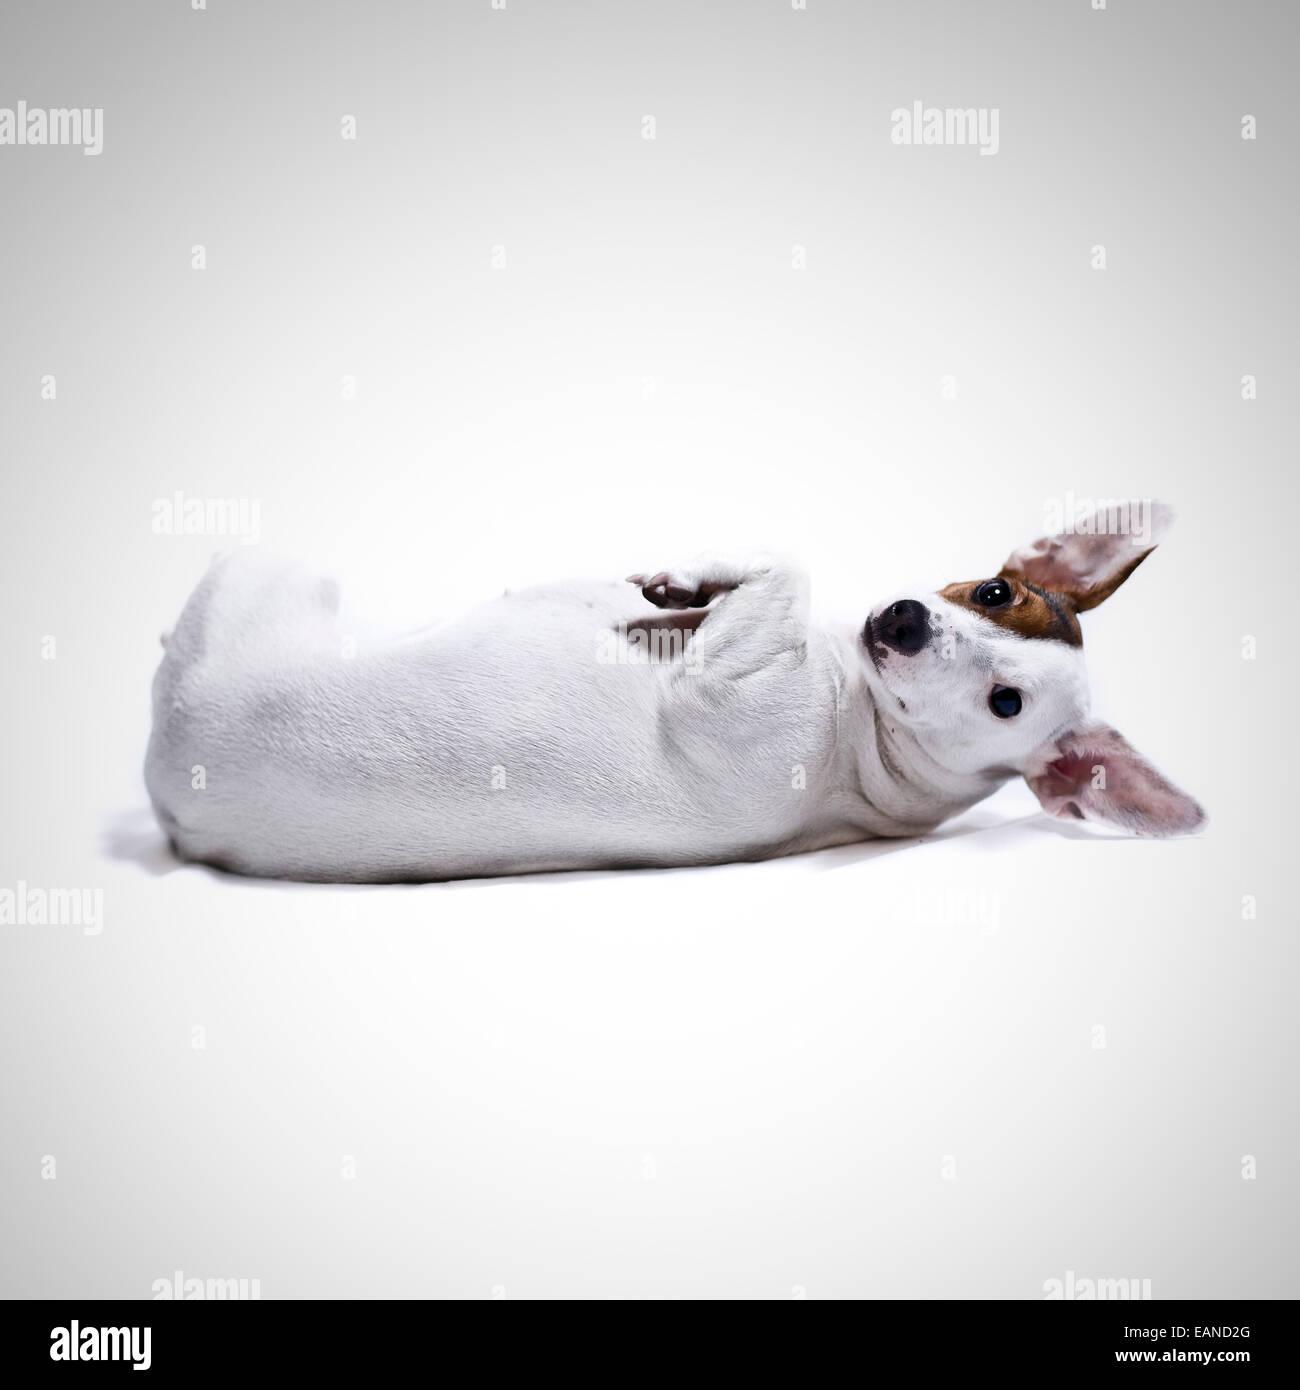 Dog laying upside down on back, isolated on white - Stock Image